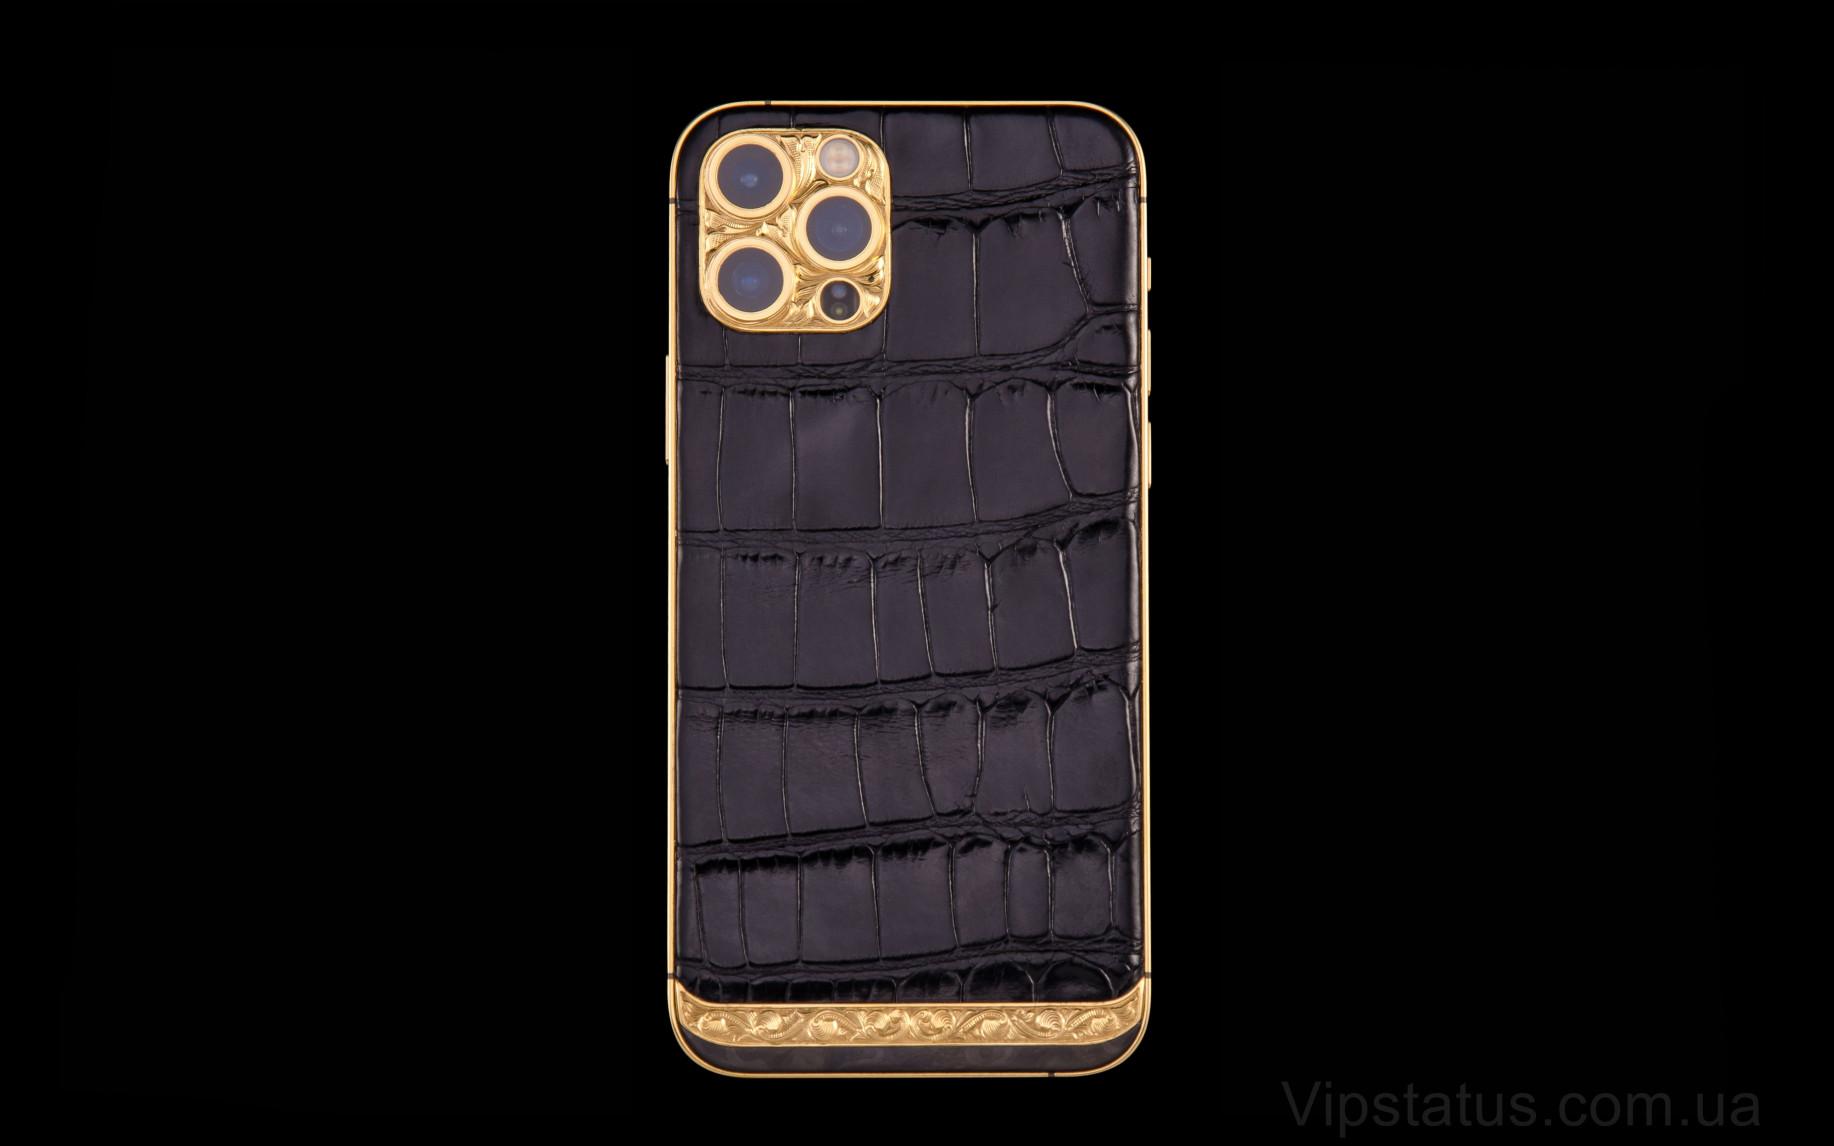 Elite Gold Edition IPHONE 12 PRO MAX 512 GB Gold Edition IPHONE 12 PRO MAX 512 GB image 10